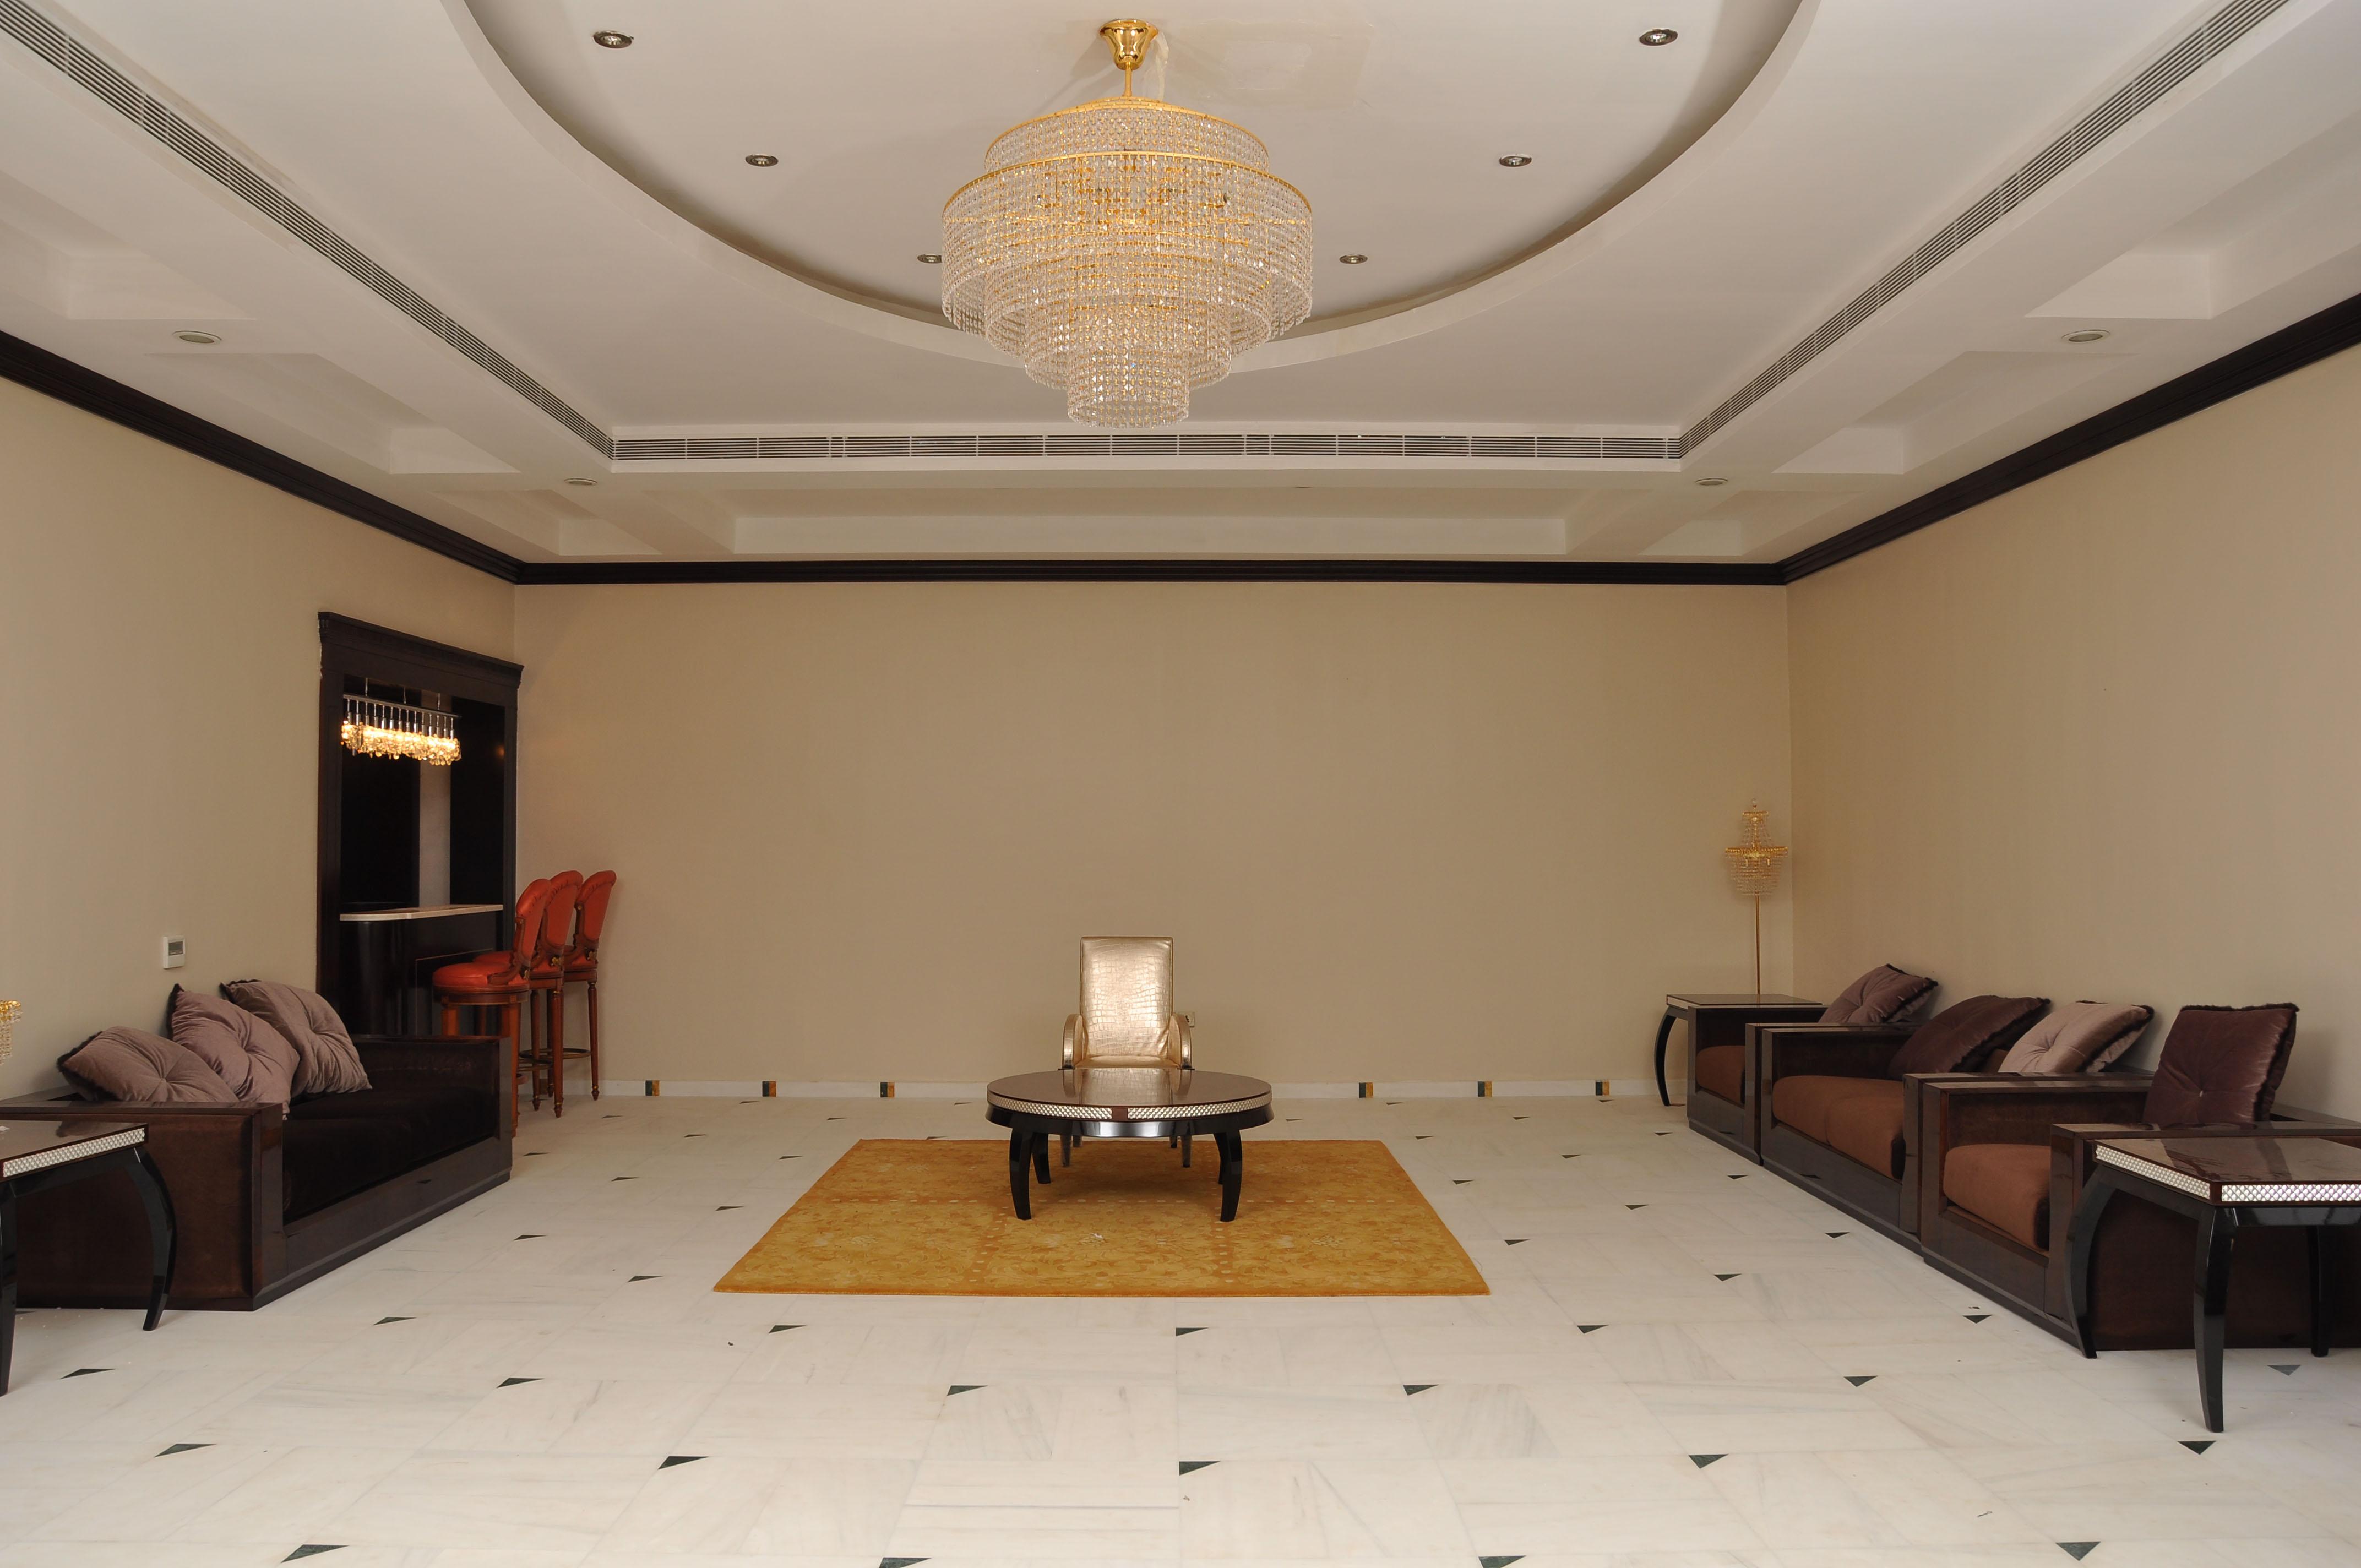 Royal Room, Architect, Lamp, Stock, Sofa, HQ Photo